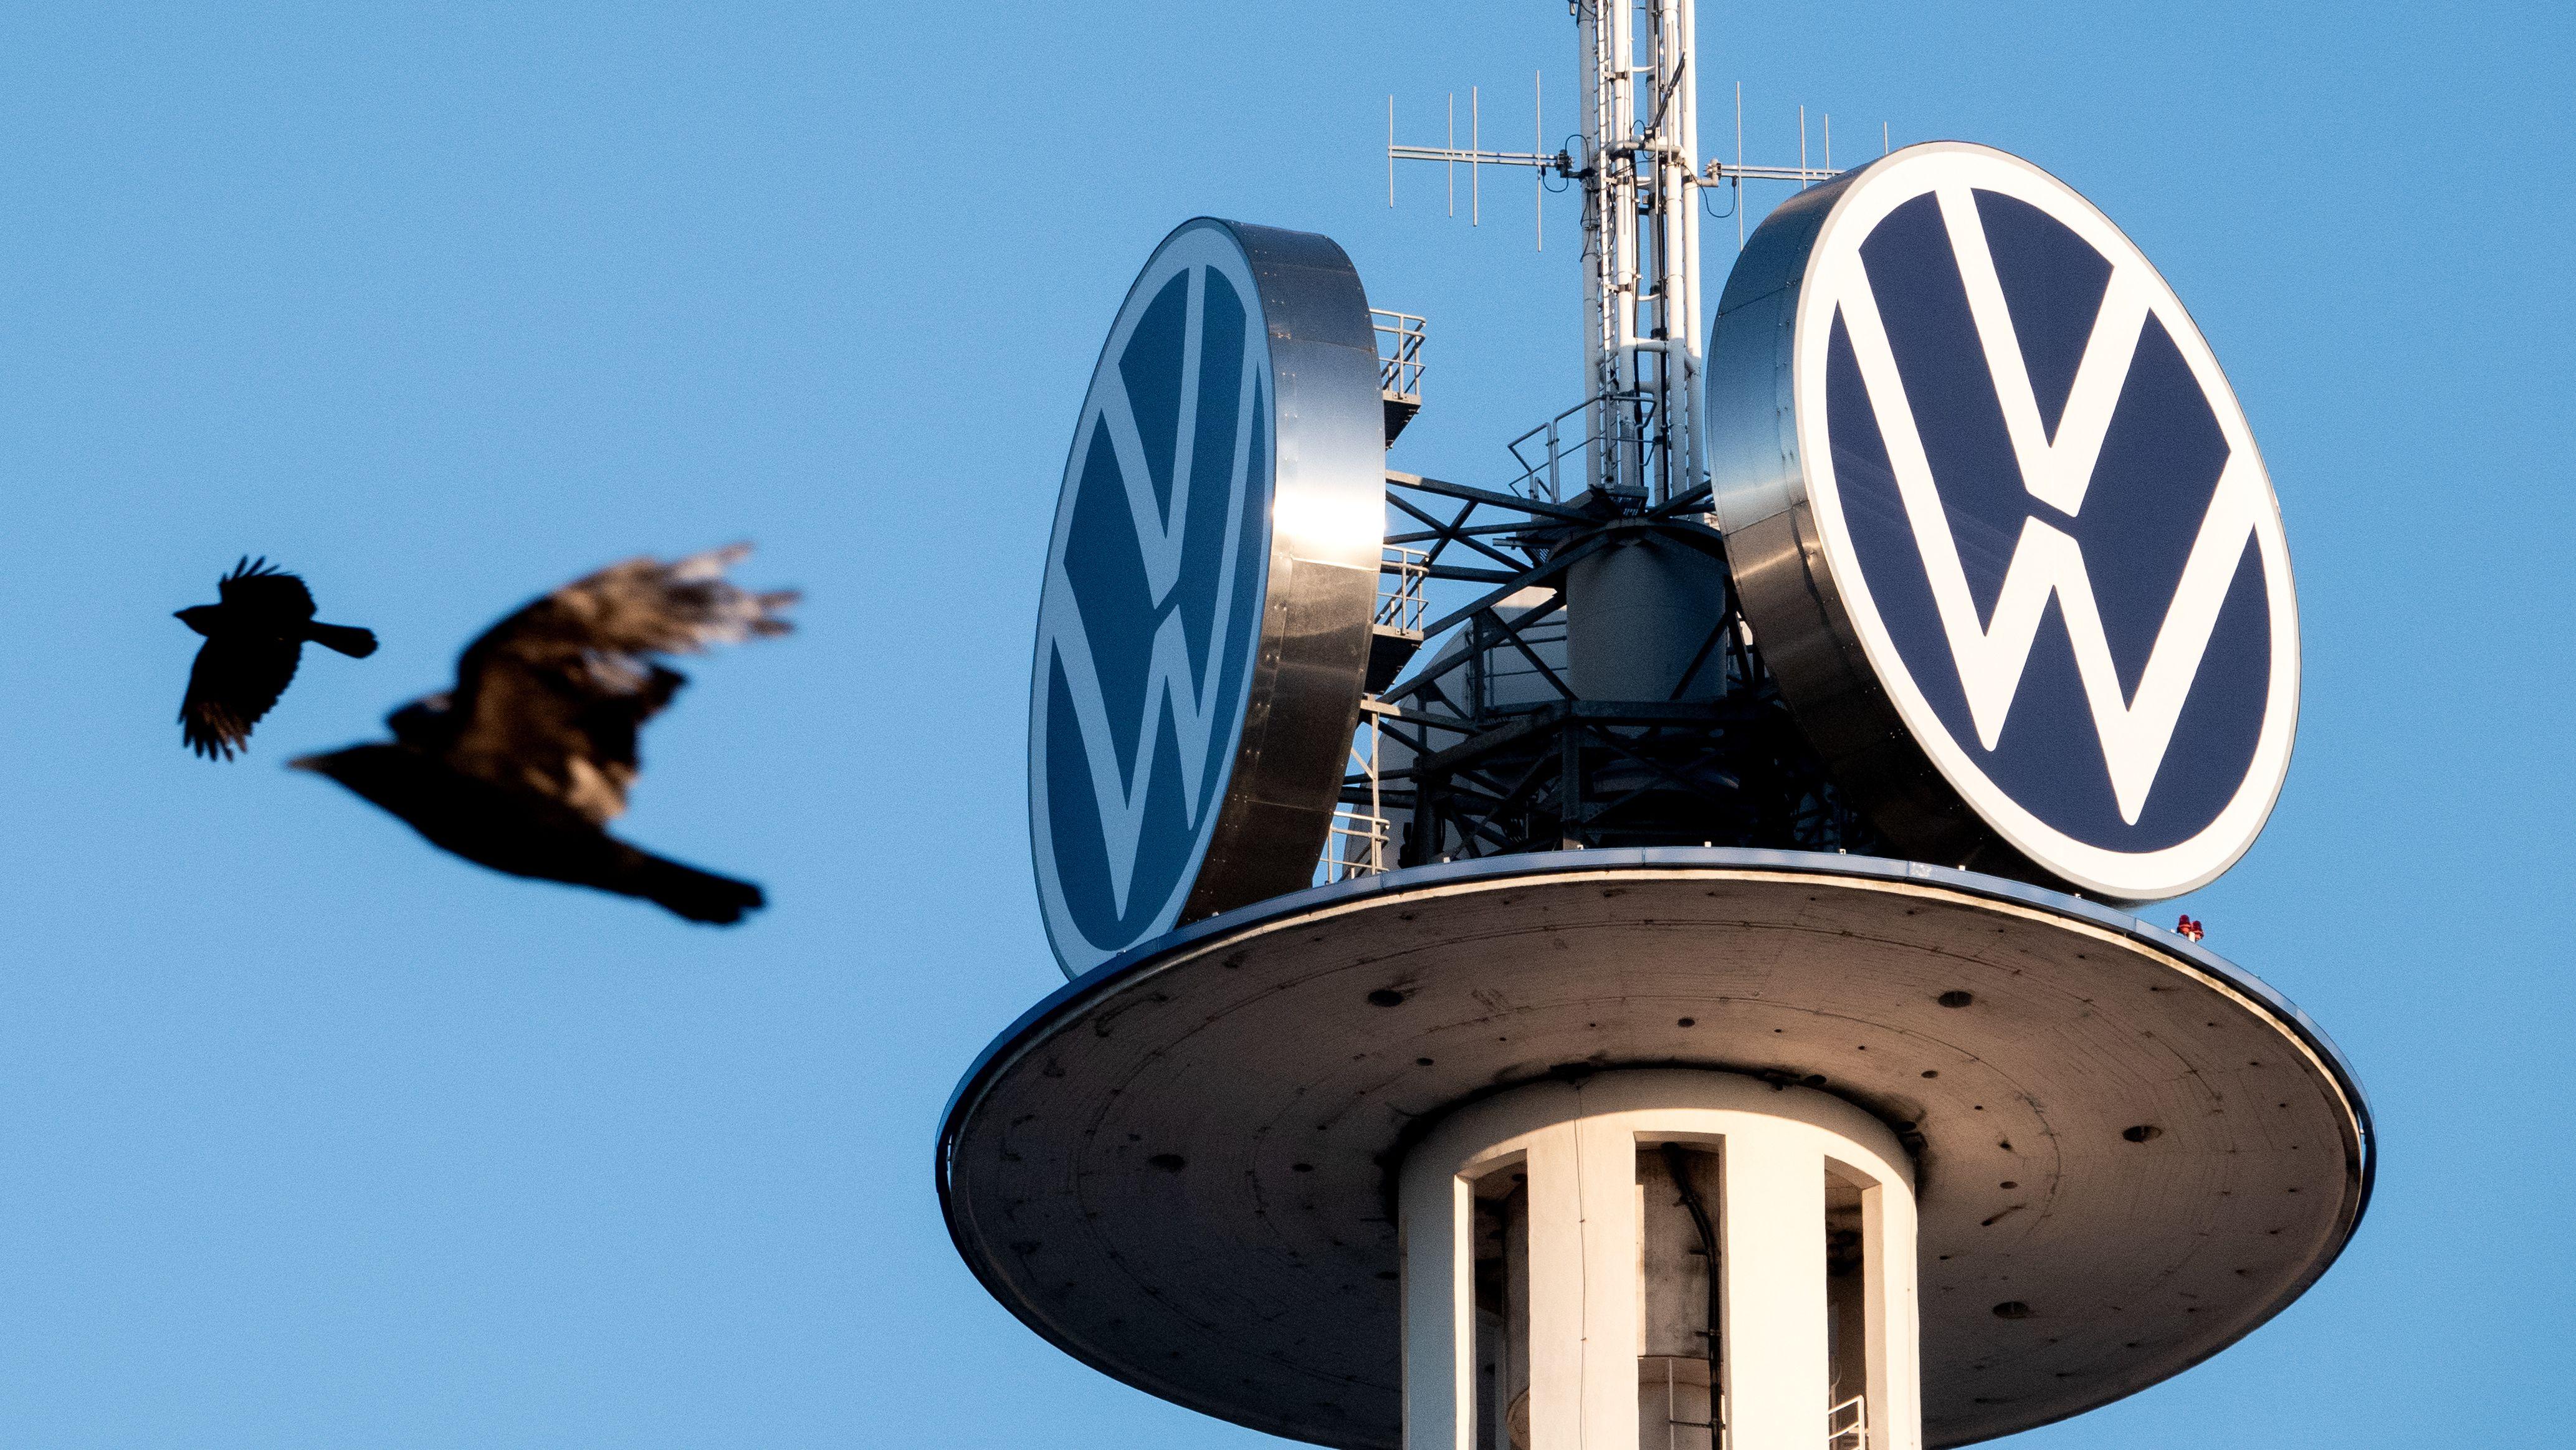 VW-Turm Hannover